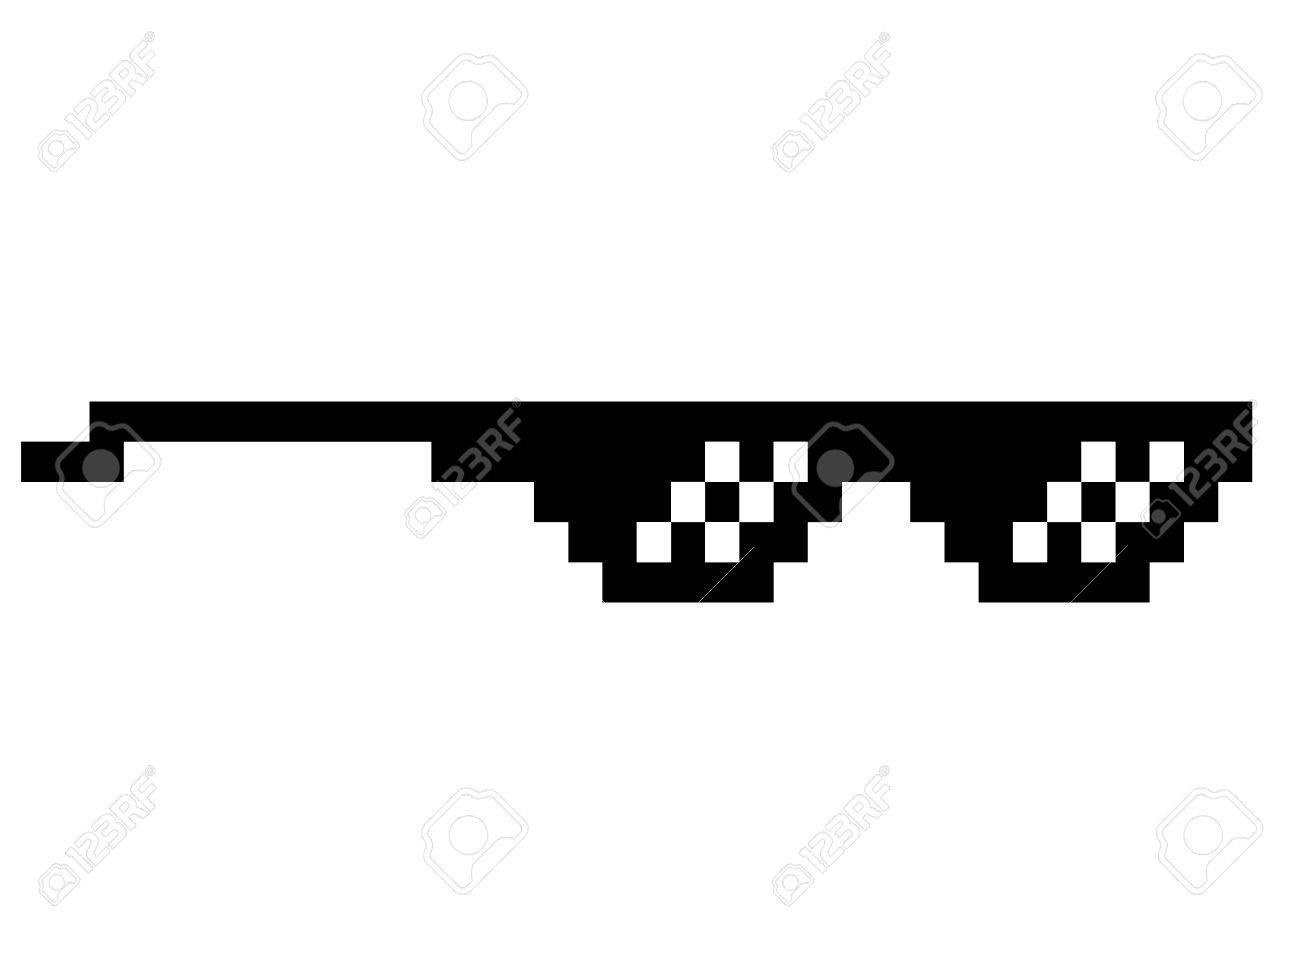 Modern Style In Art Trend Meme Pixel Black Thug Life Like Glasses NOX8n0wPk